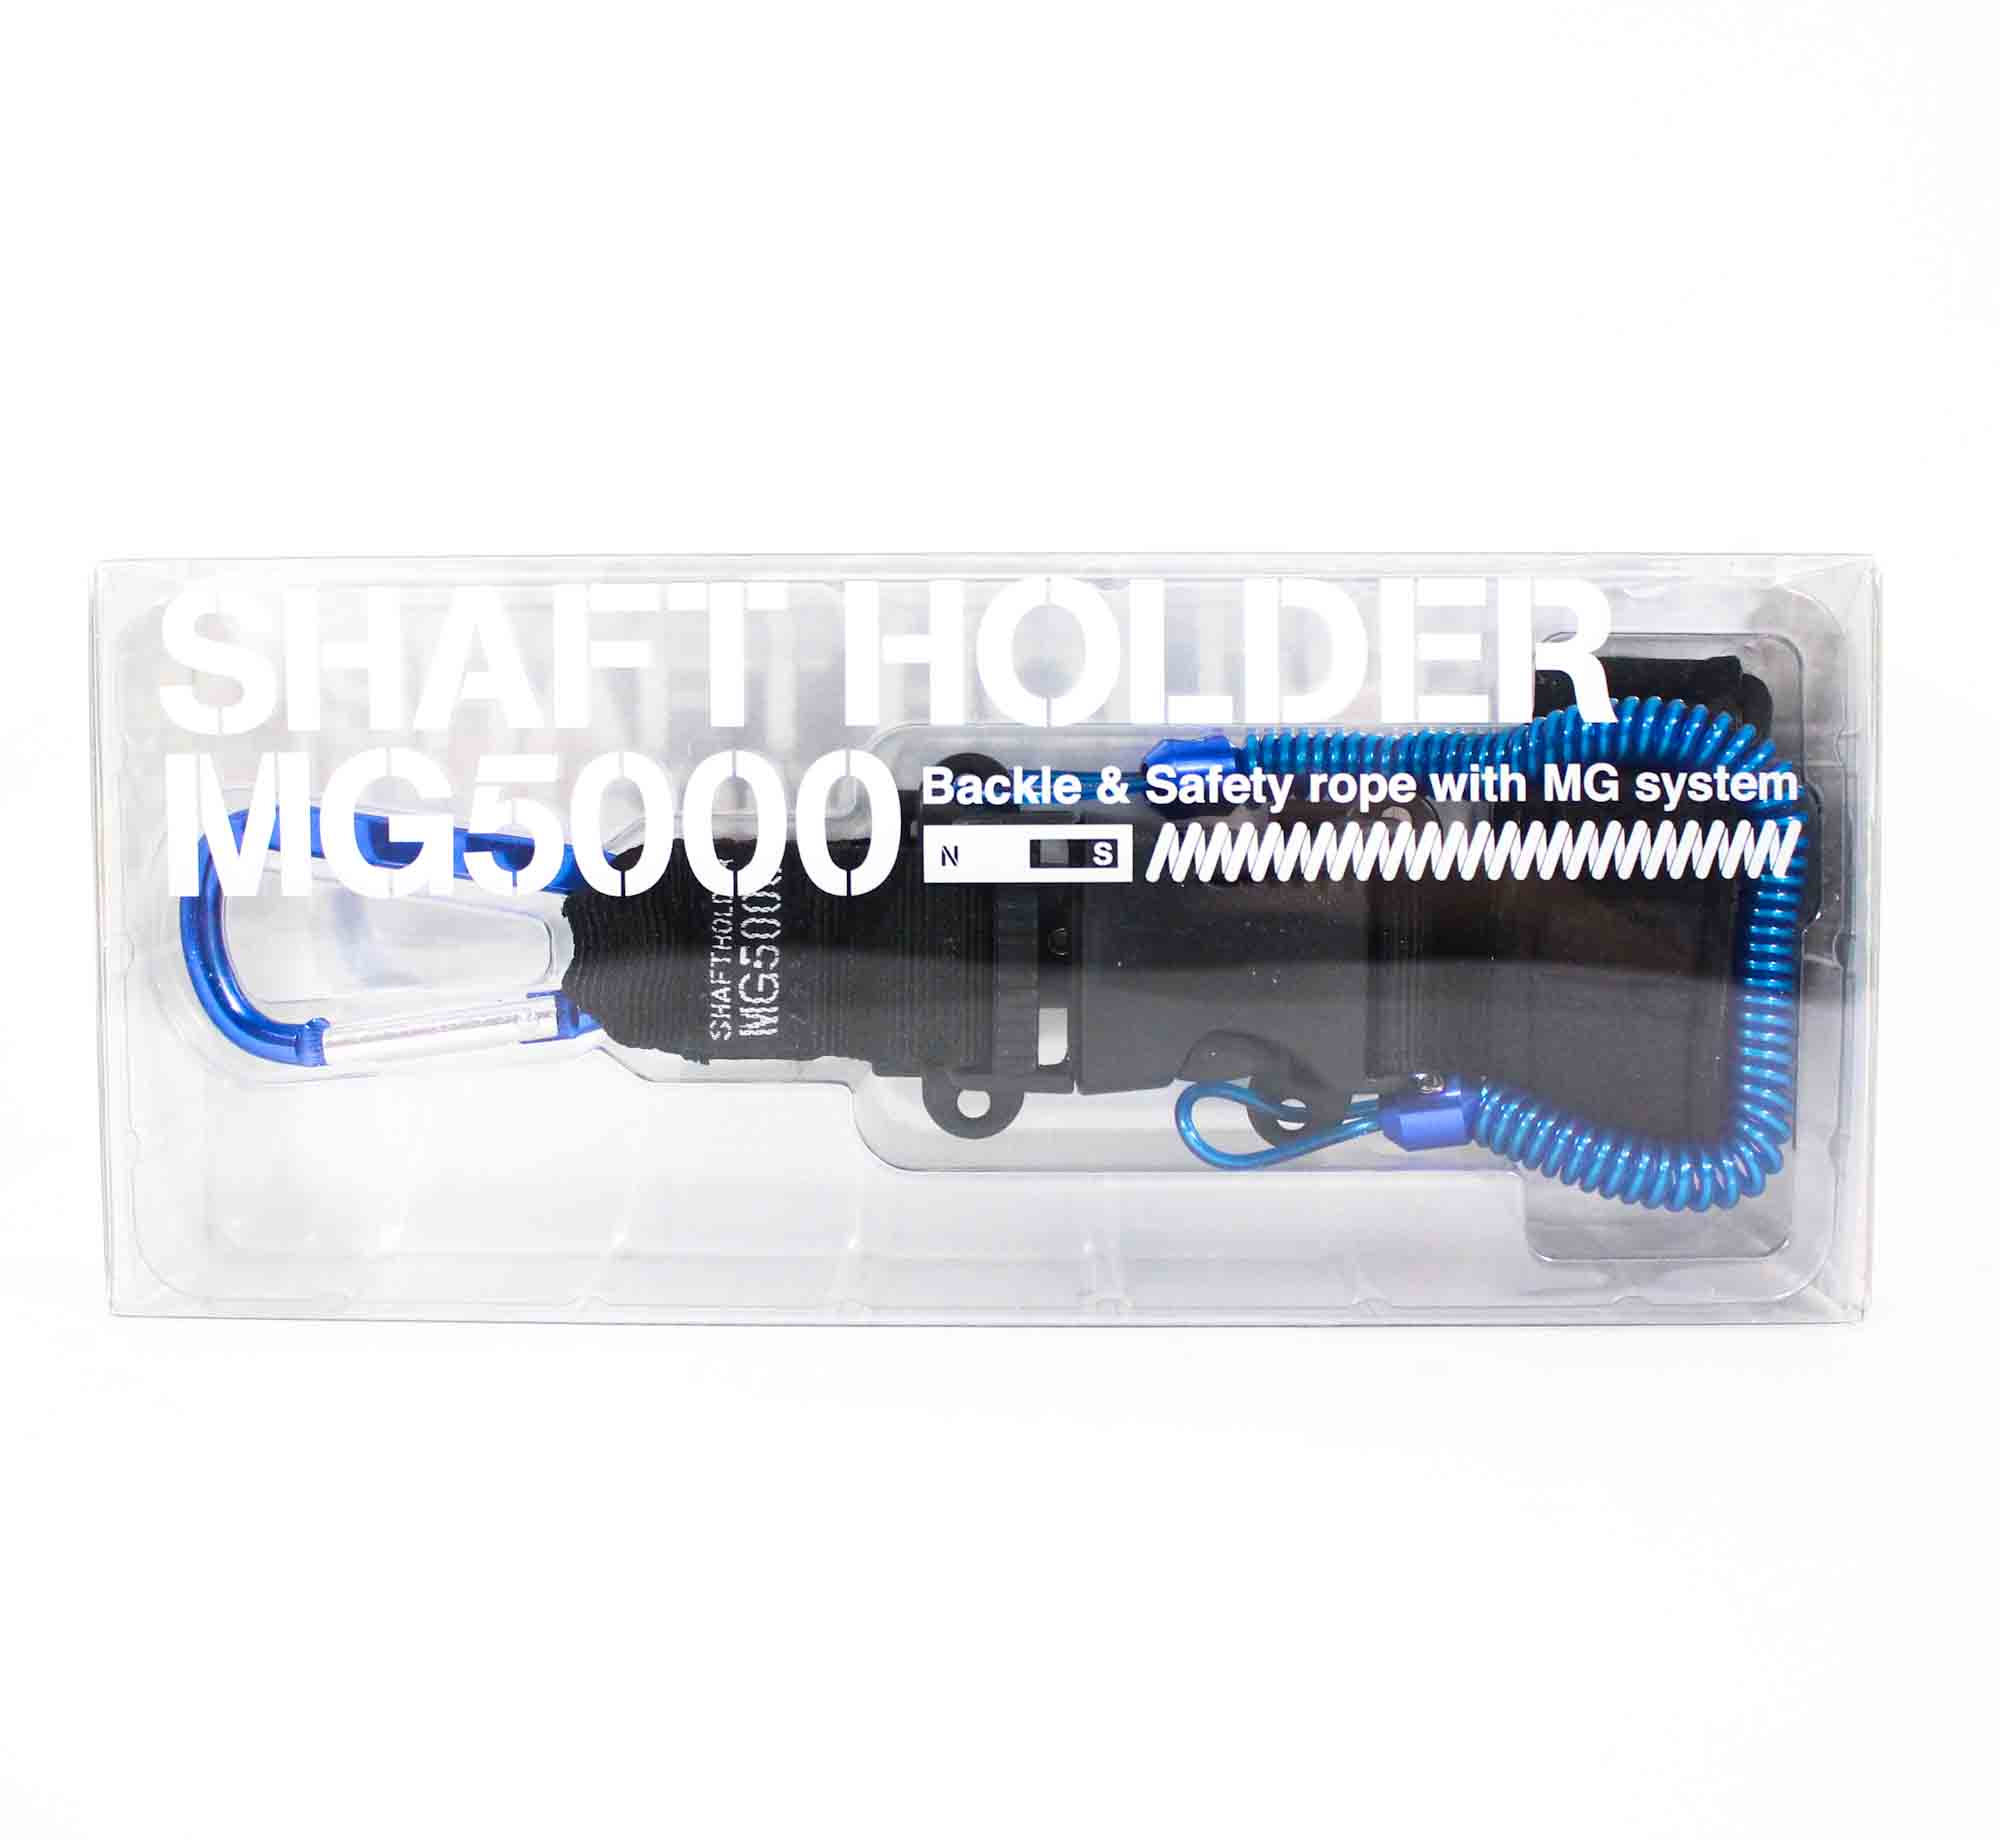 Daiichi #33261 Shaft Holder MG 5000 Magnet System 120 cm Blue (2611)